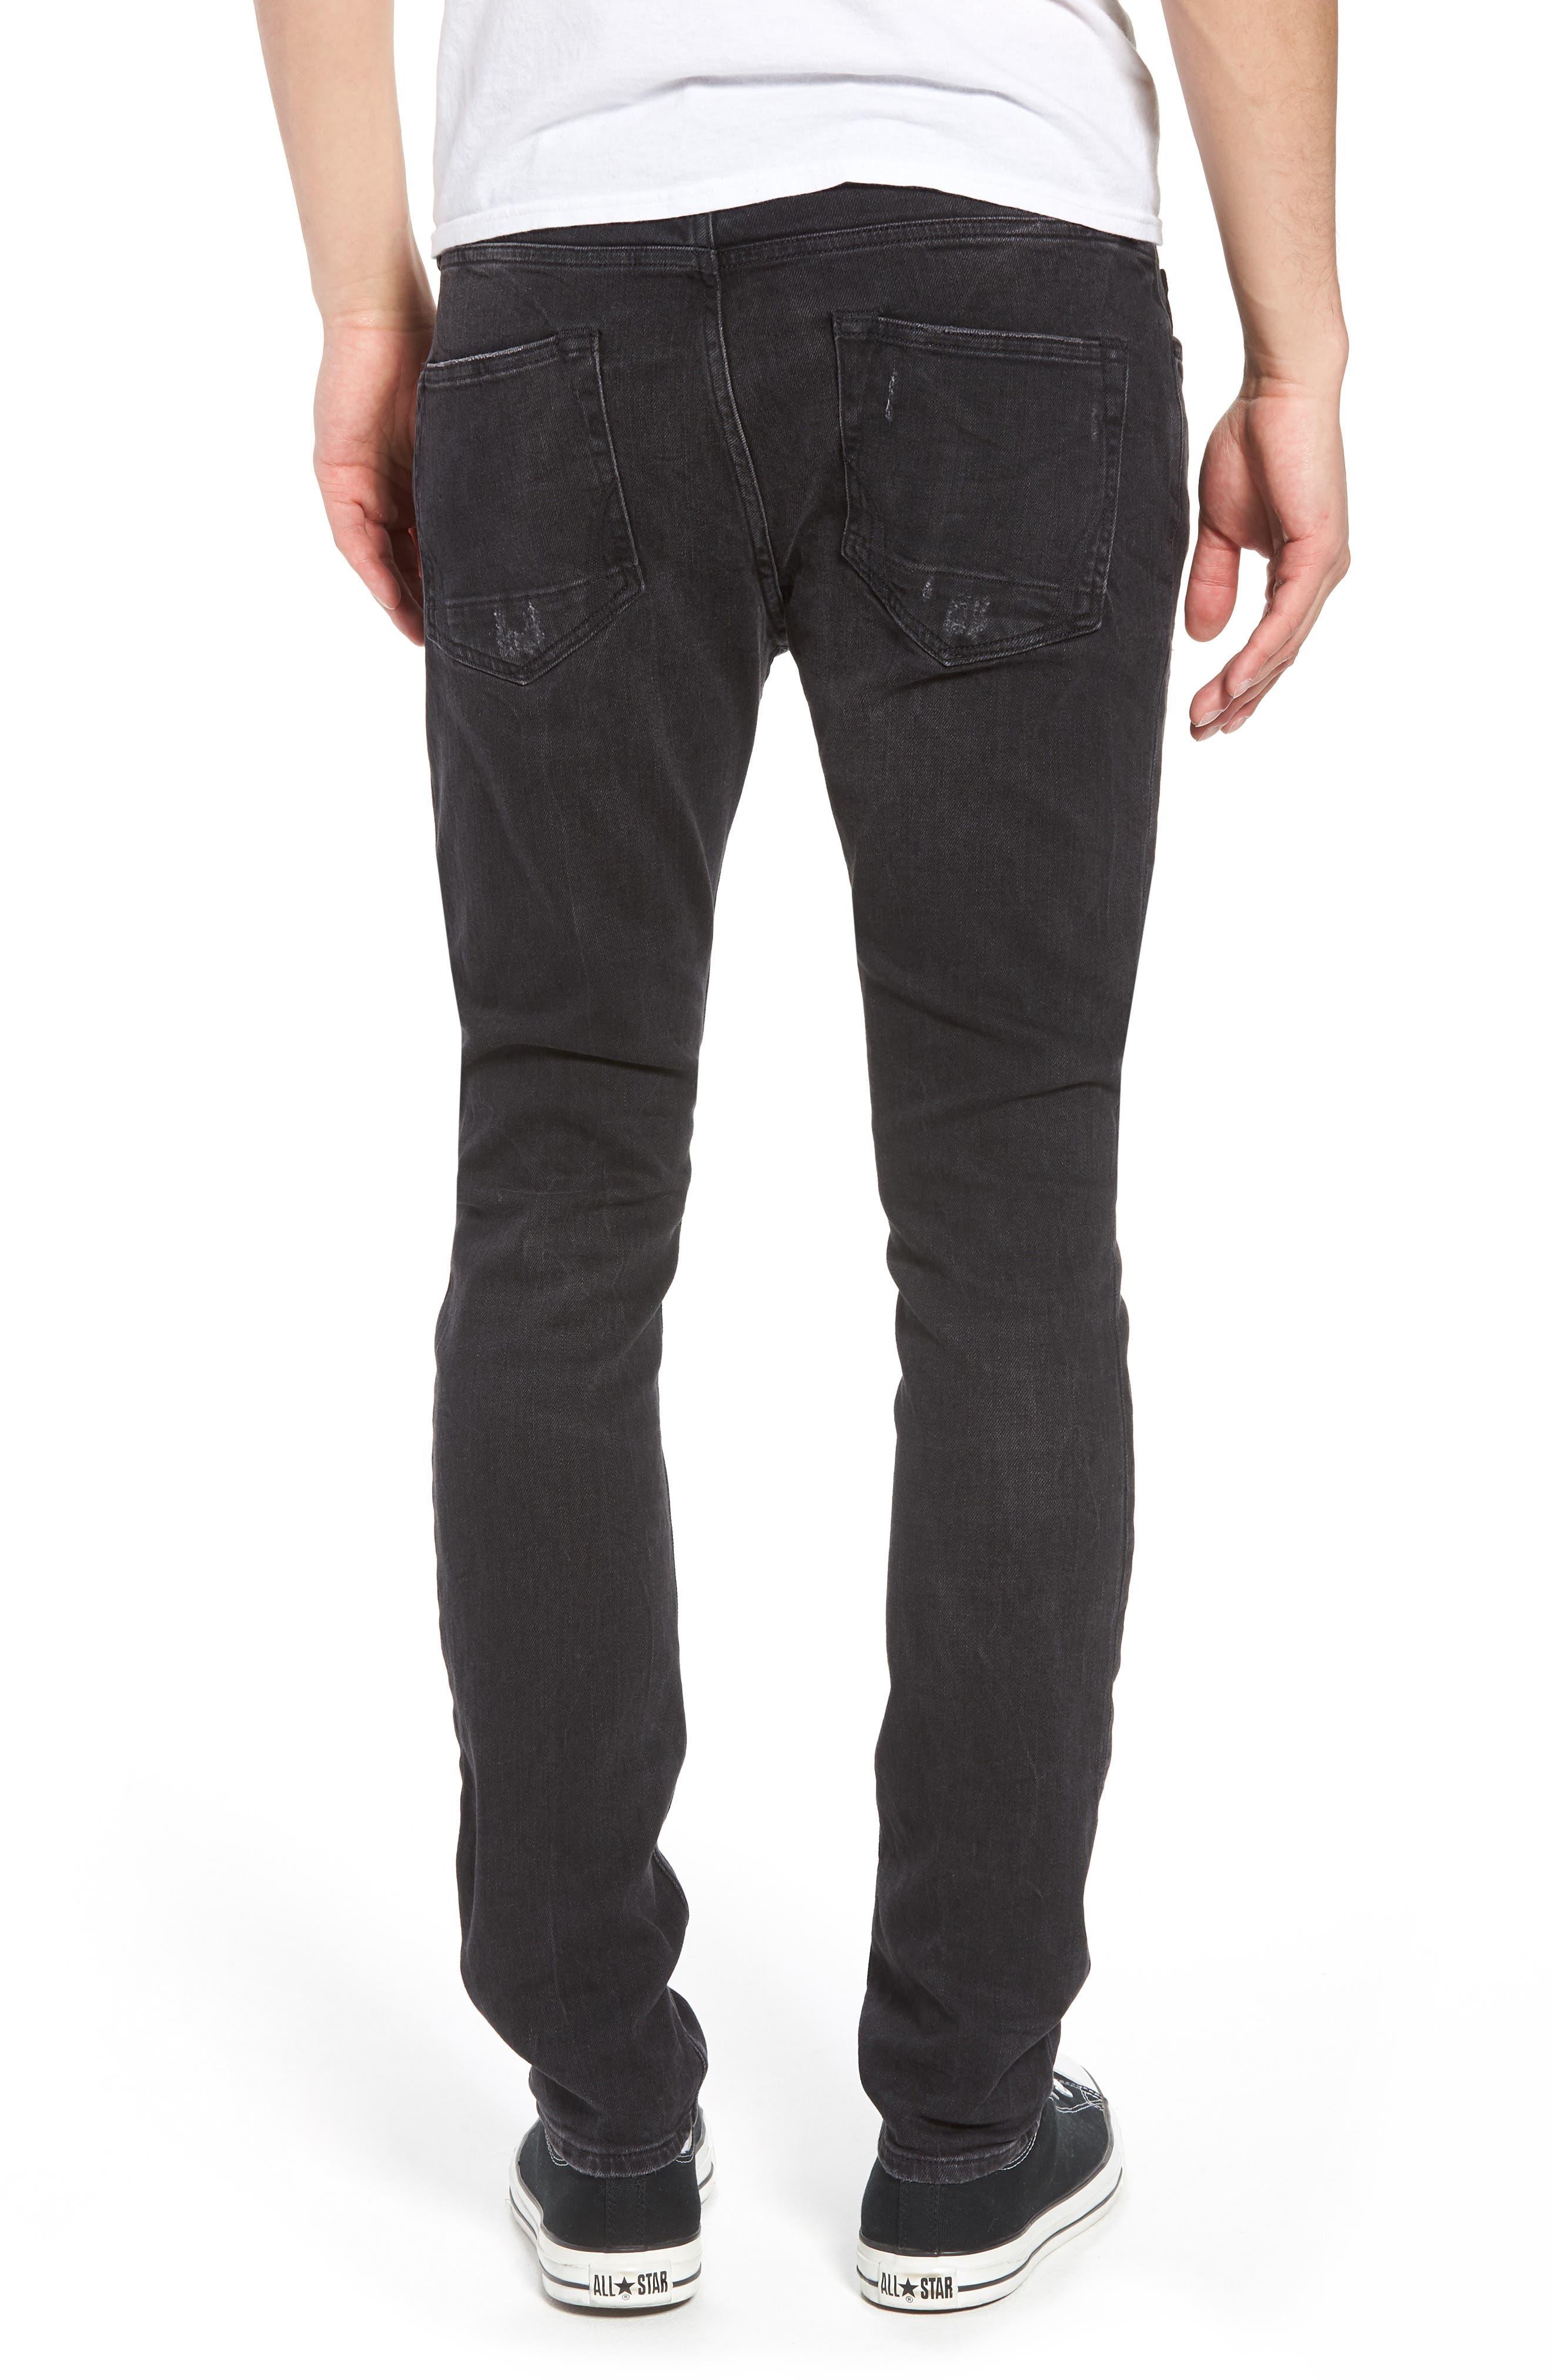 Raveline Skinny Fit Jeans,                             Alternate thumbnail 2, color,                             001